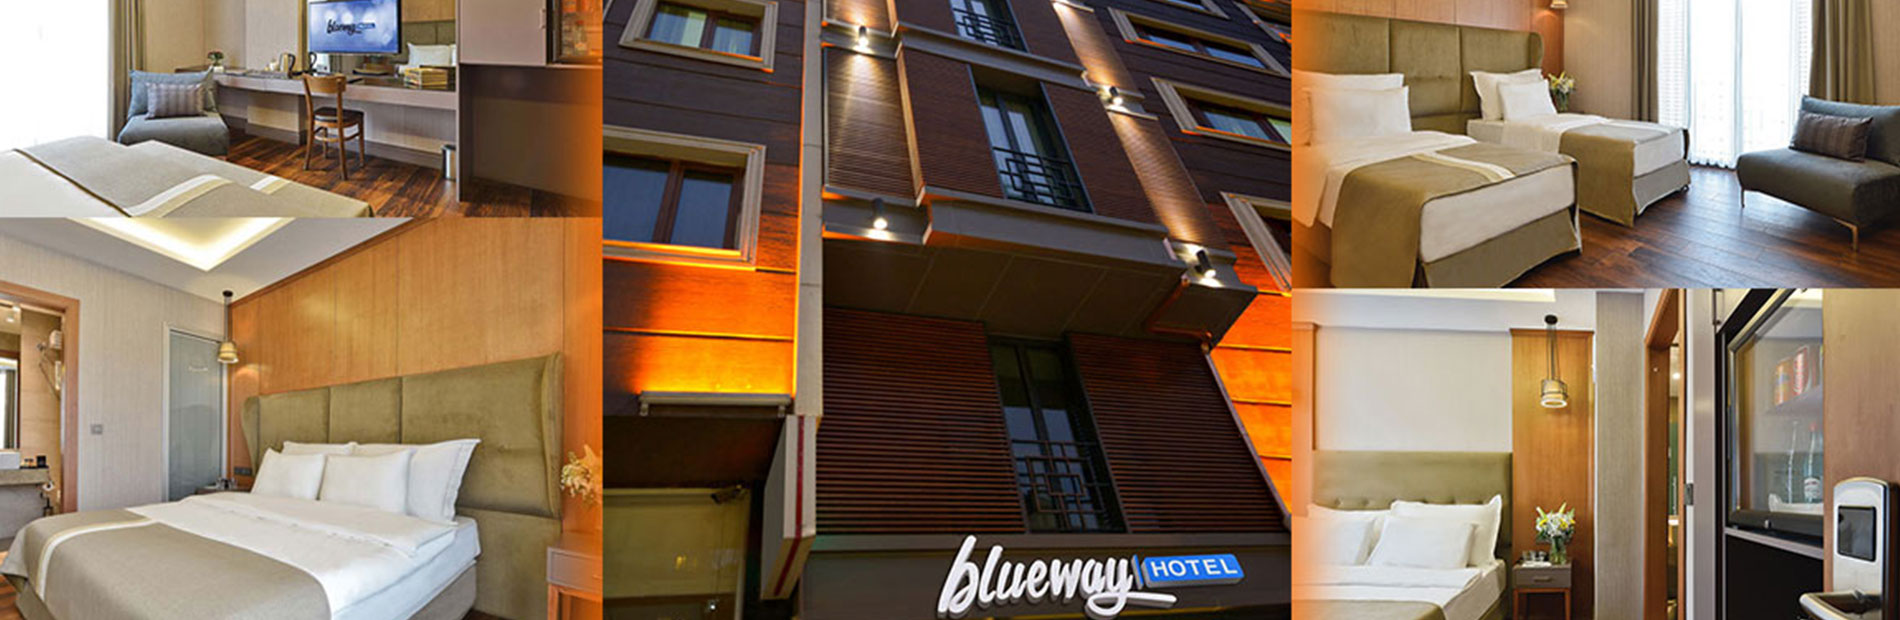 bluewayhotelcity-1900-620